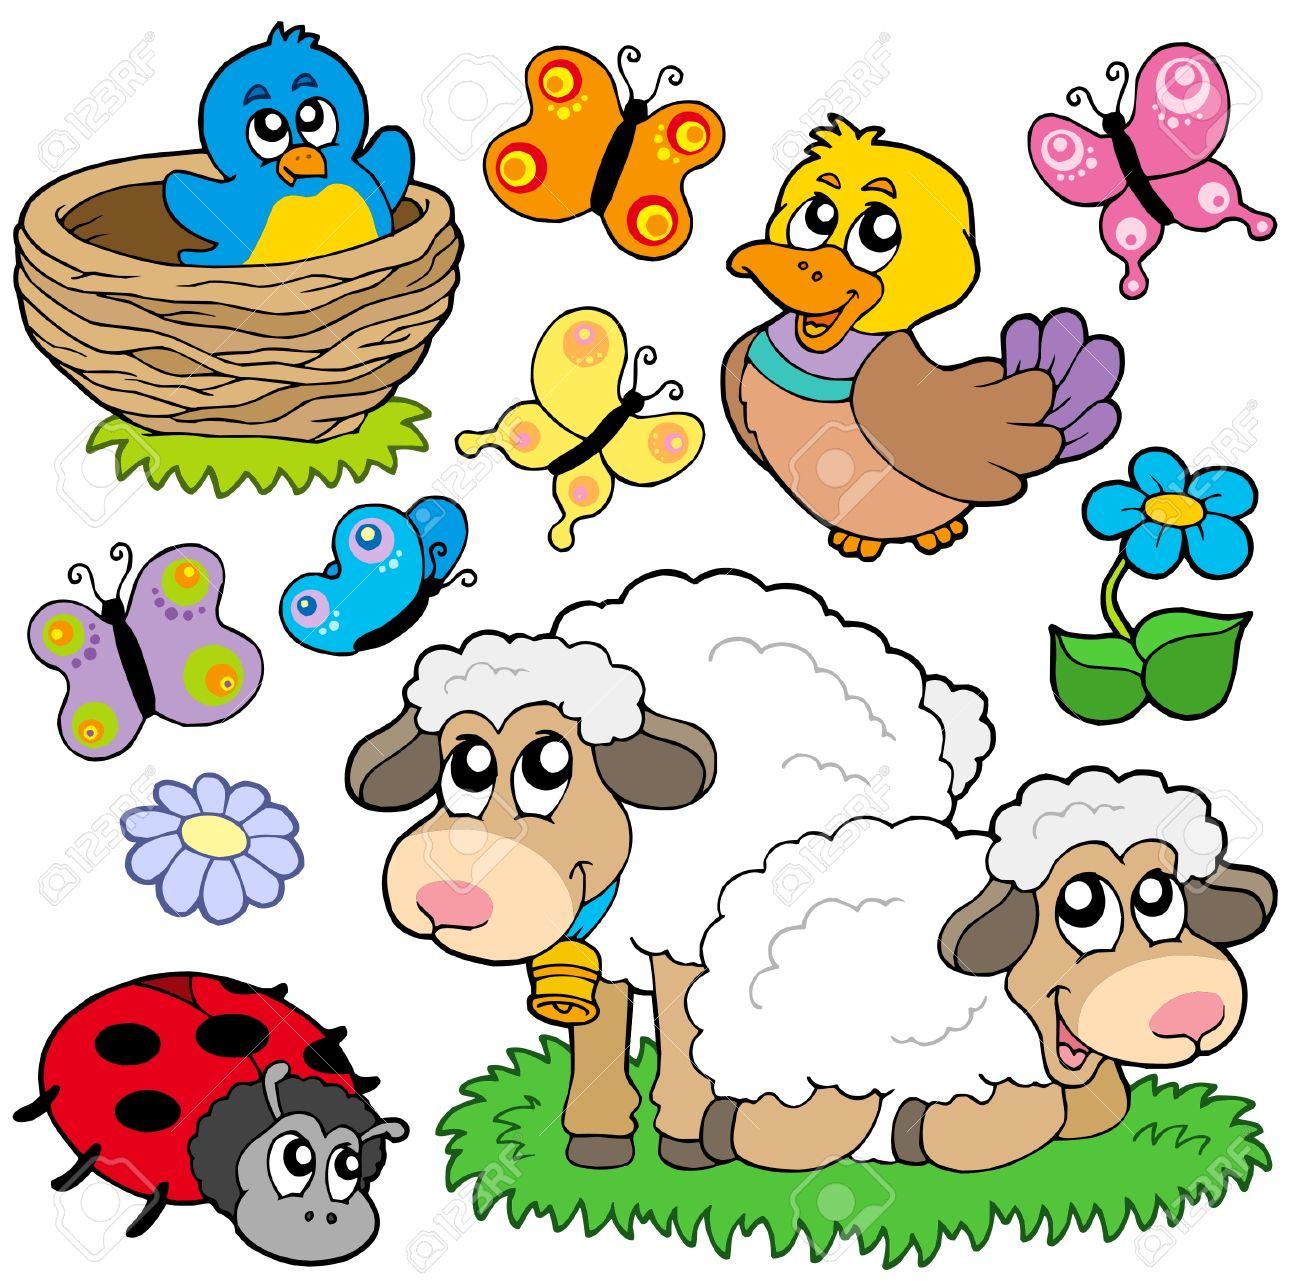 Various spring animals - vector illustration. Stock Vector - 6370102